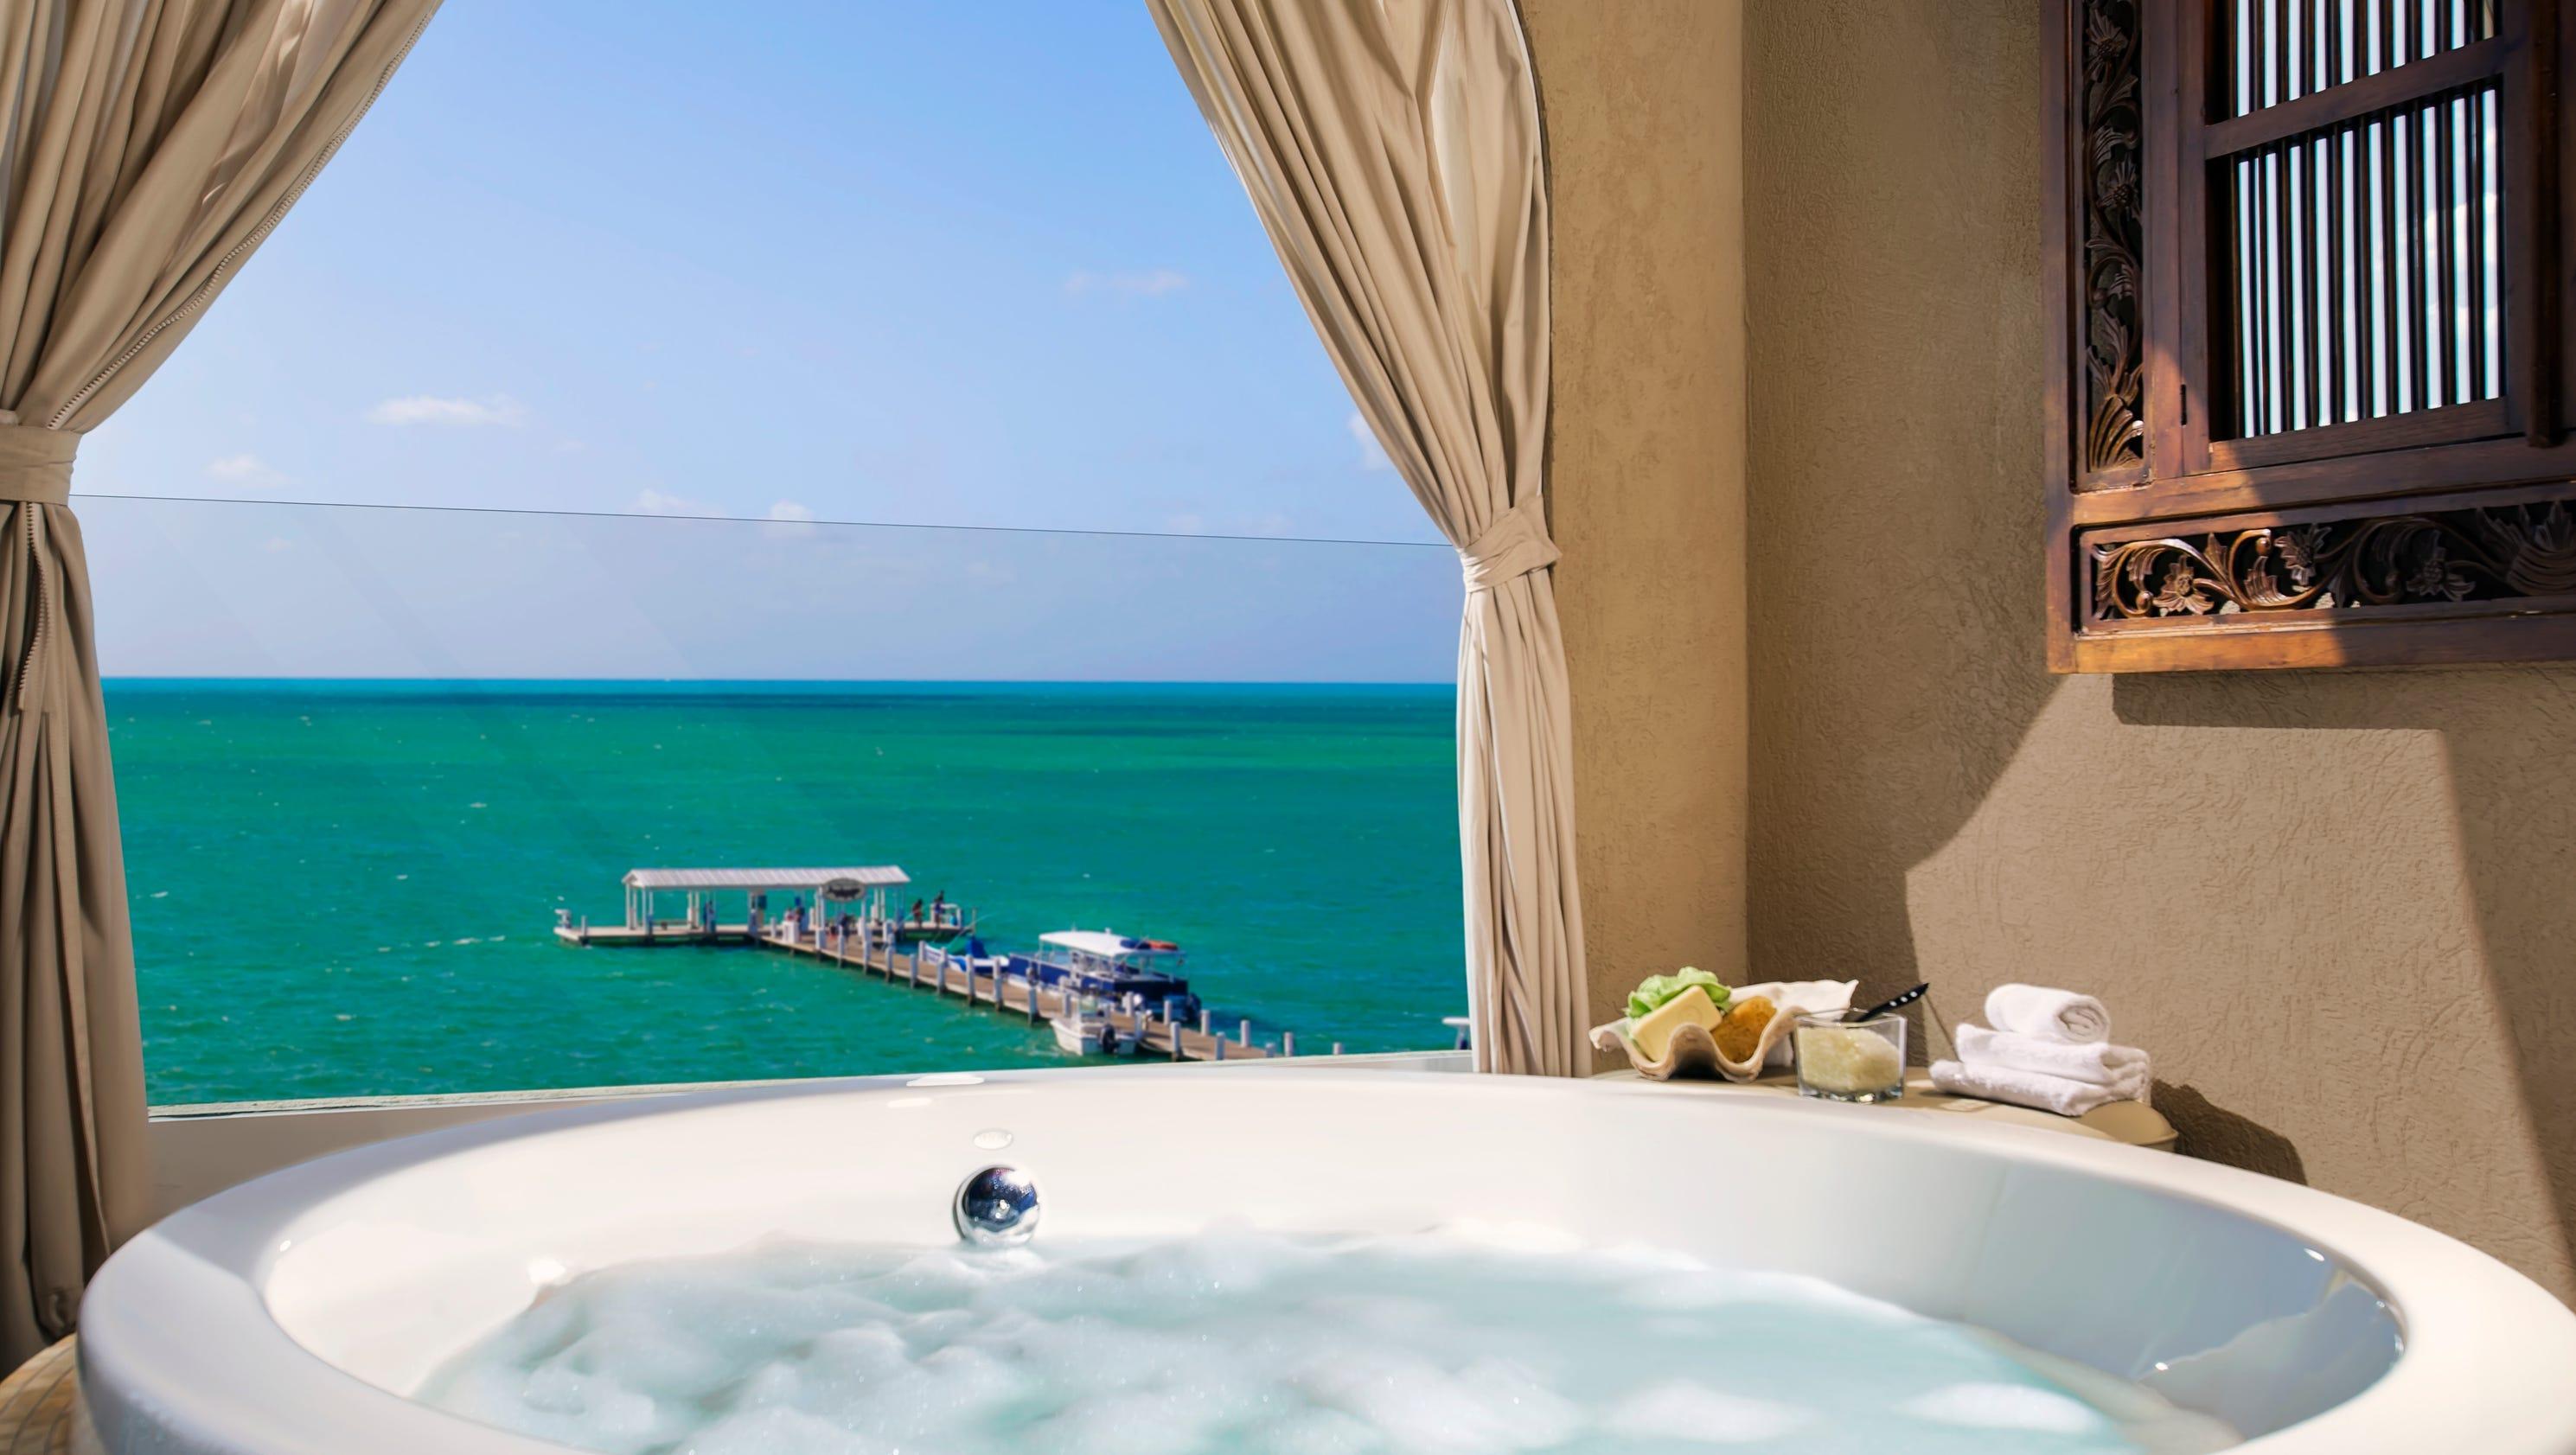 Hot Tub In Hotel Room Florida